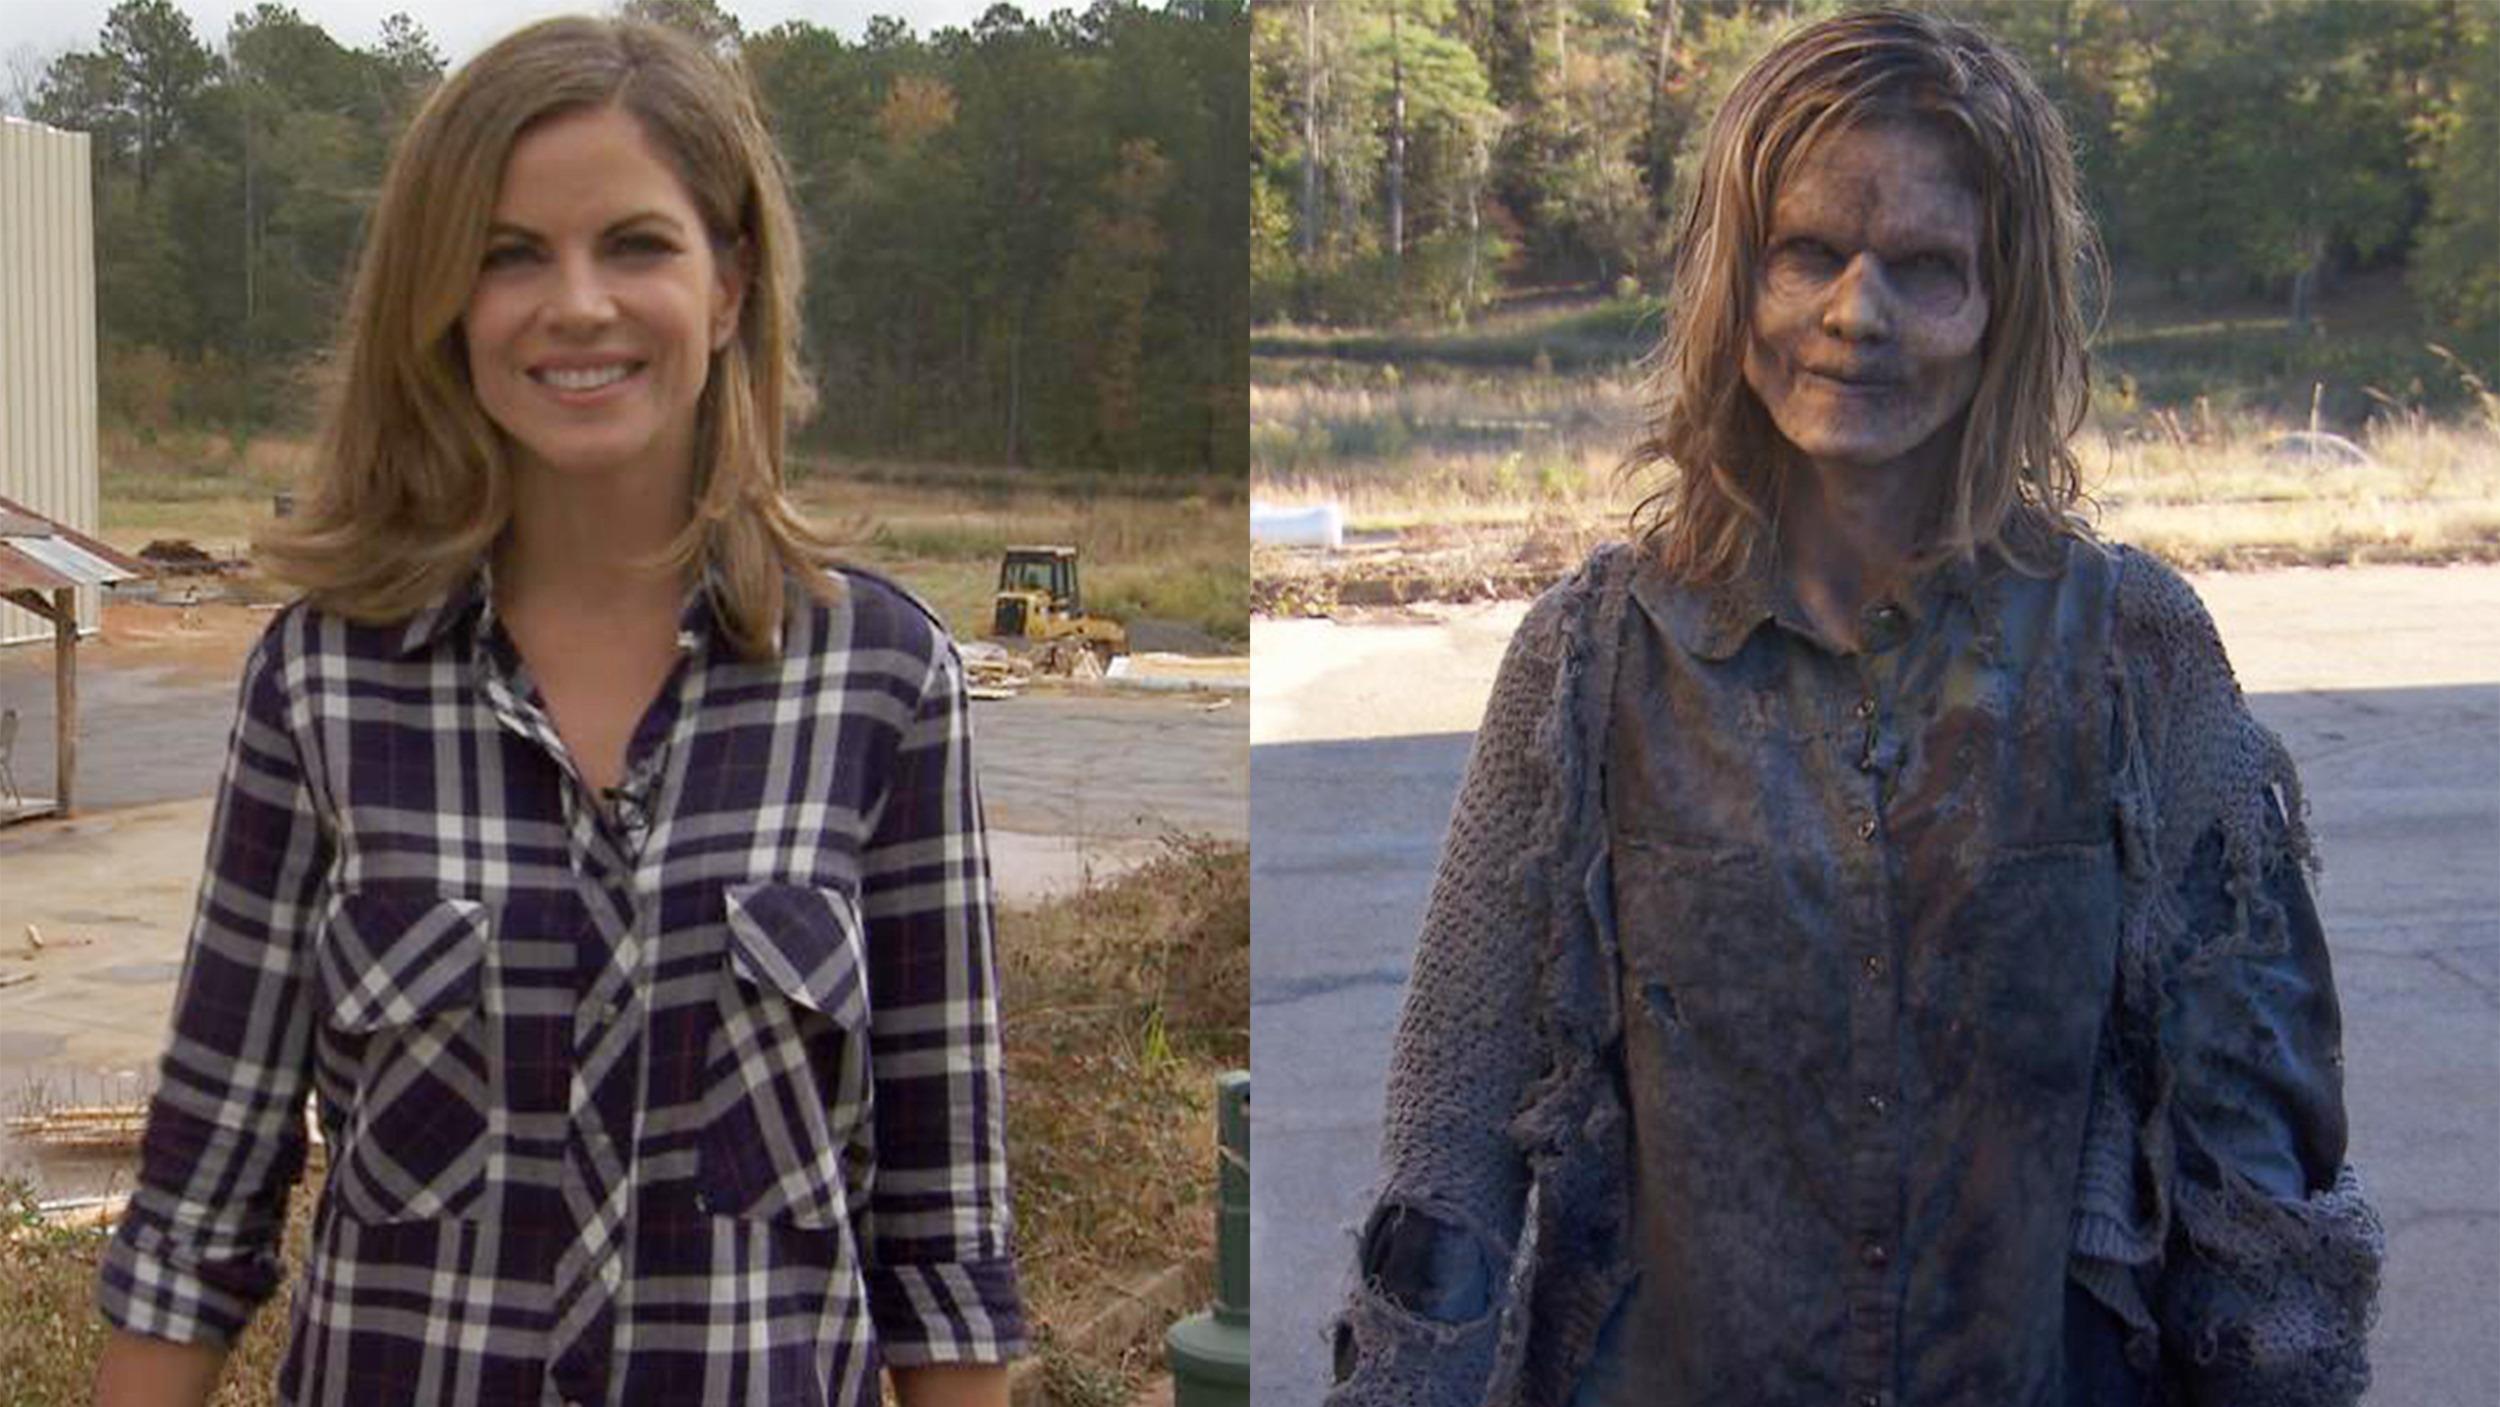 Walking Dead: 'Dressed To Kill': Watch Natalie Transform Into A 'Walking